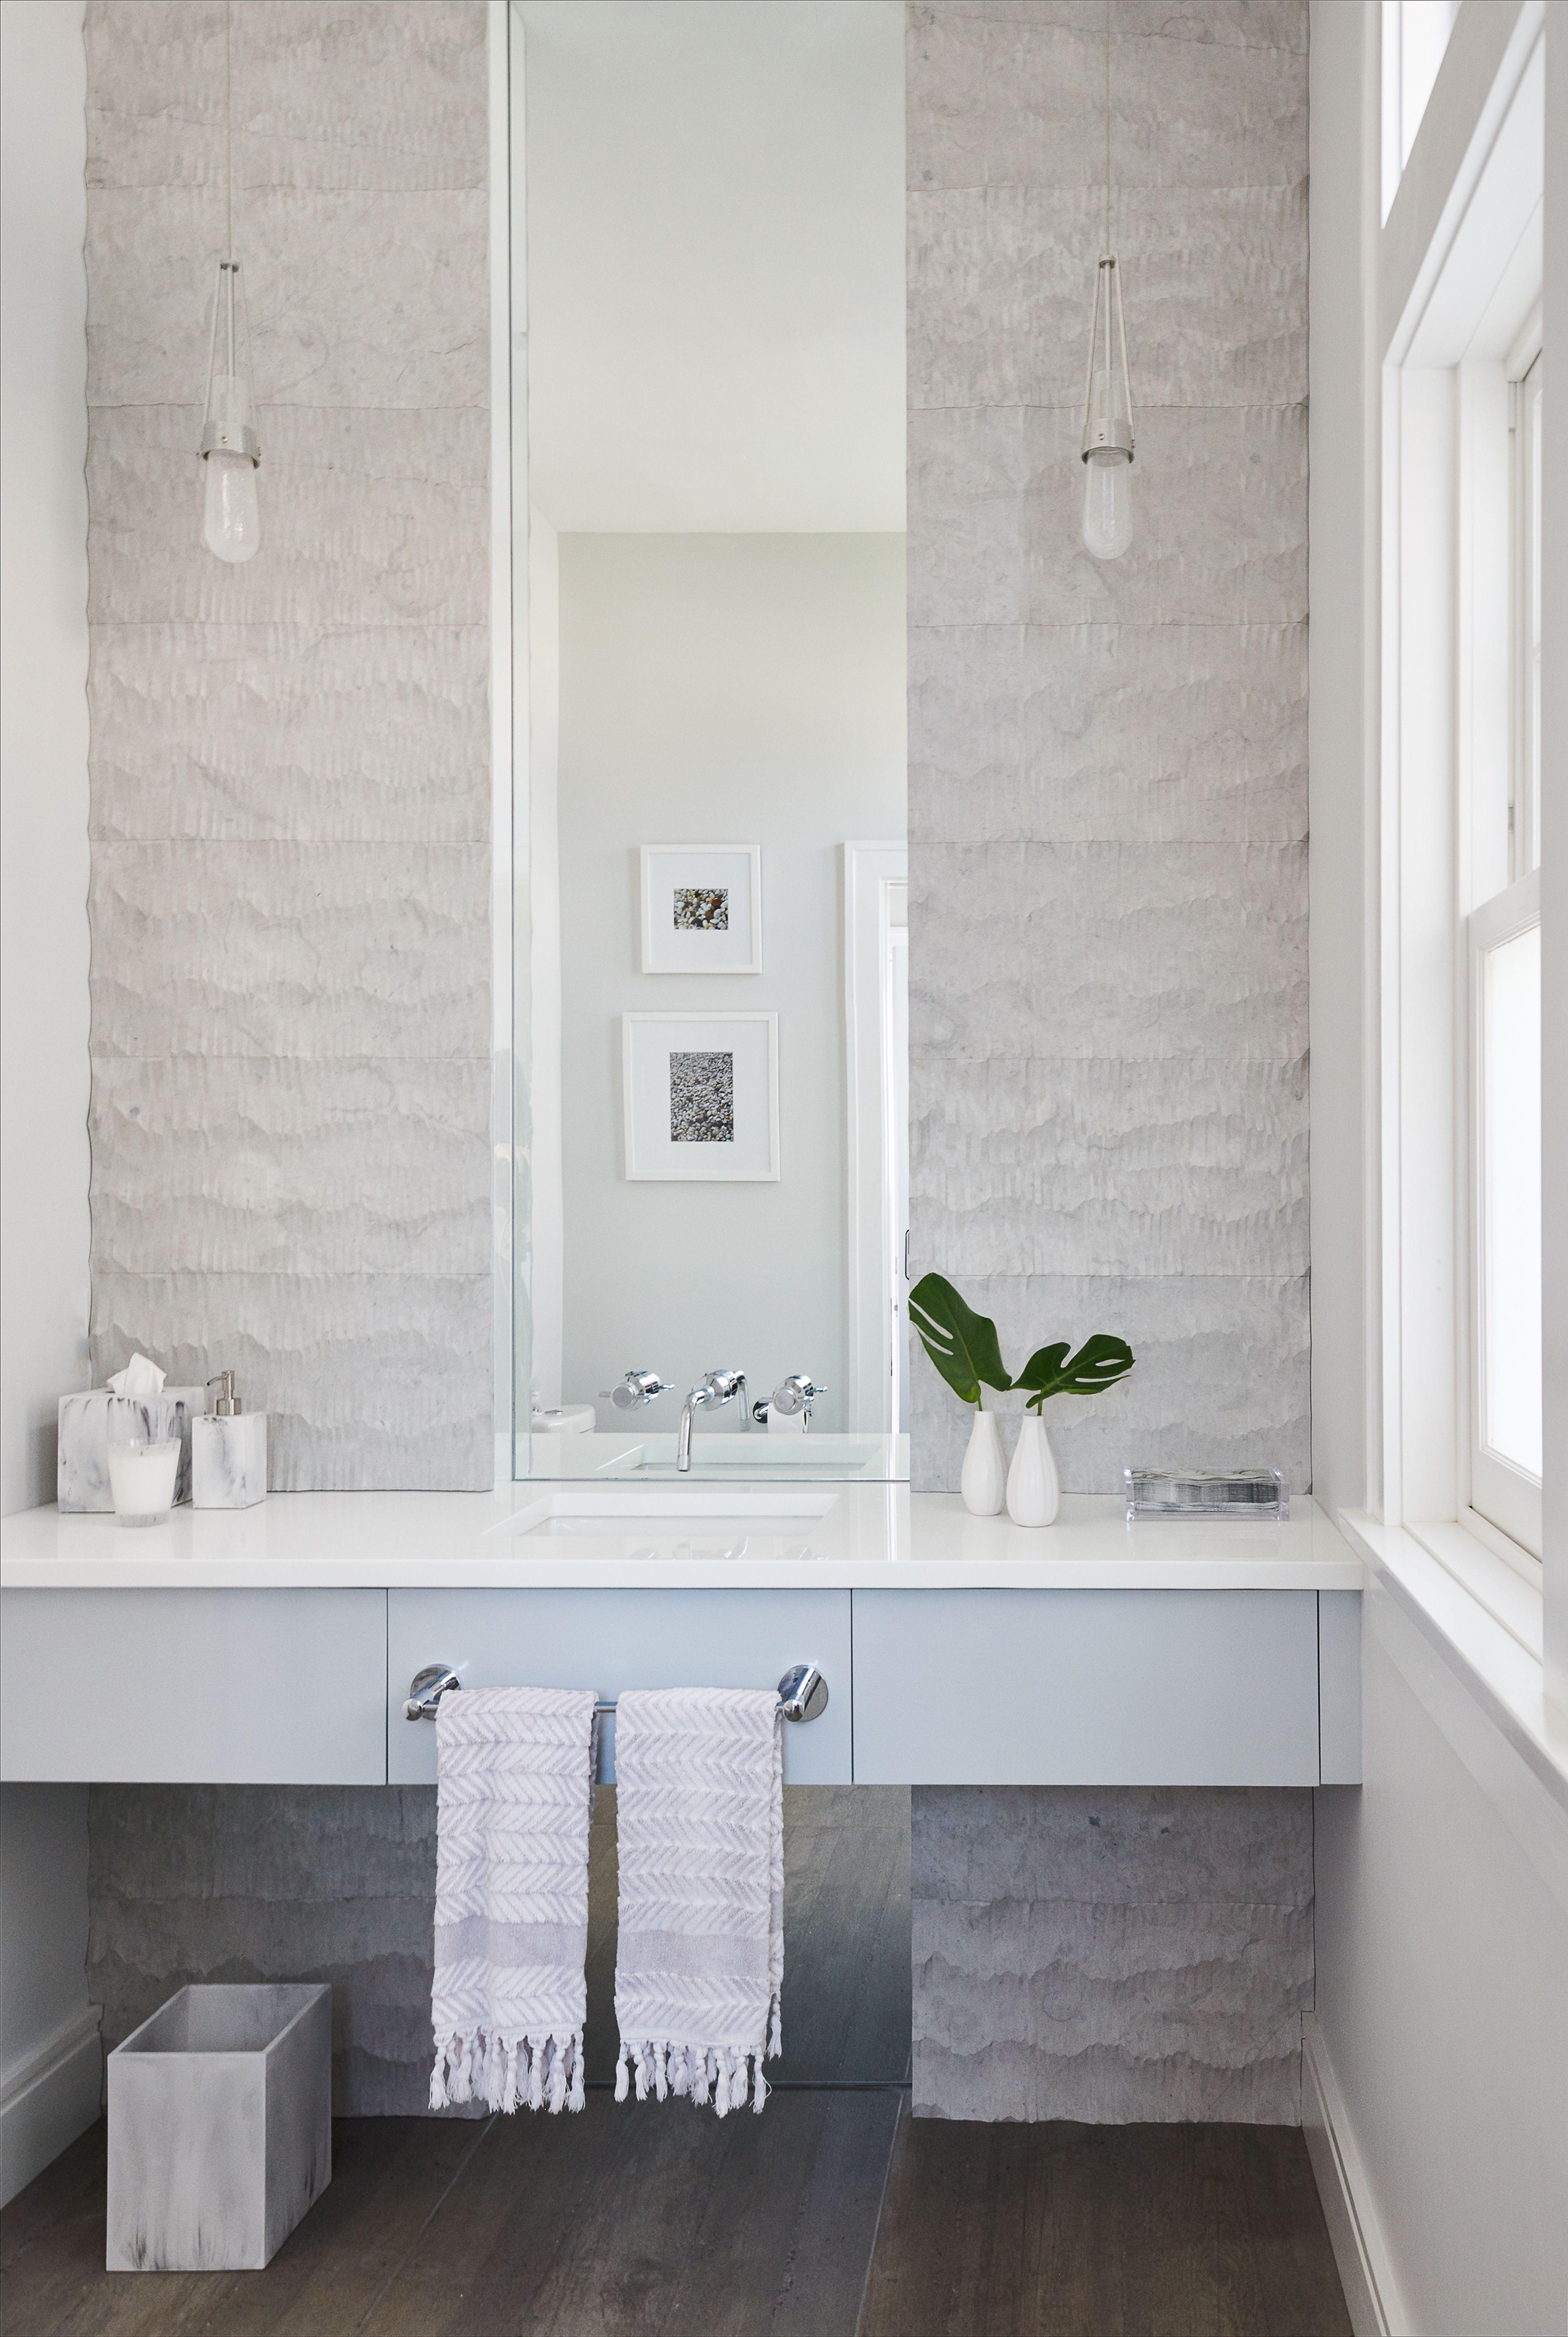 Powder Room With Floating Vanity Modern Powder Rooms Floating Vanity Bathroom Mirror Lights